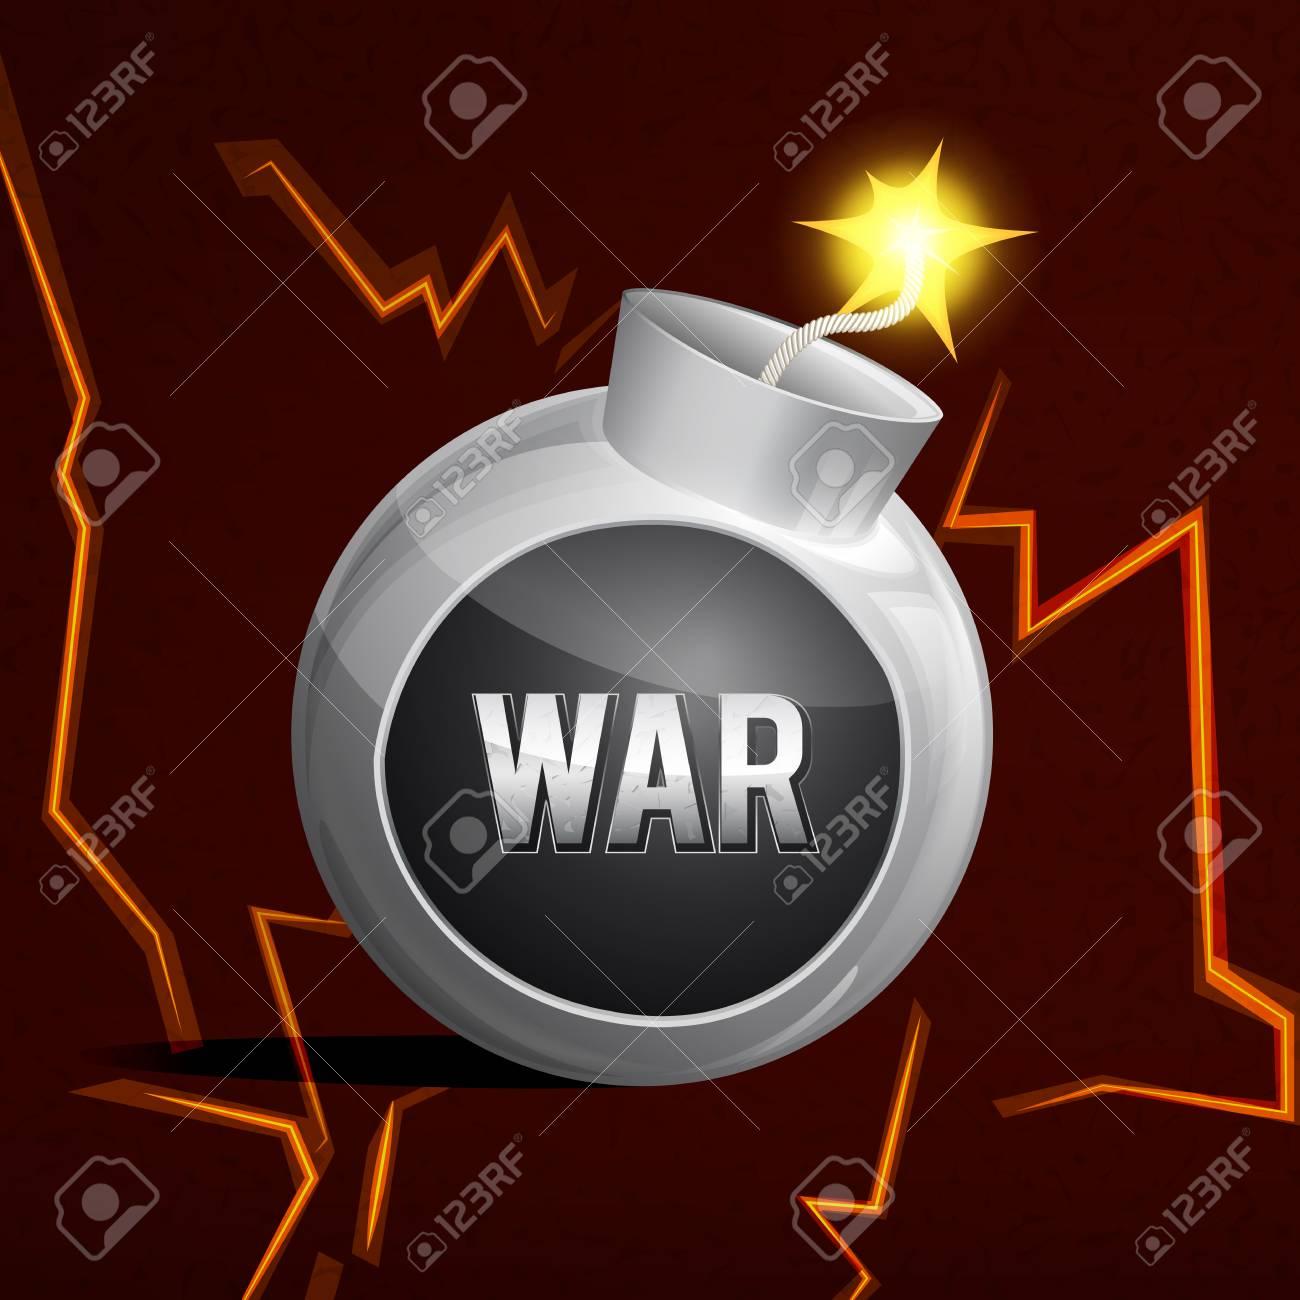 no war no bombs Stock Vector - 27539576